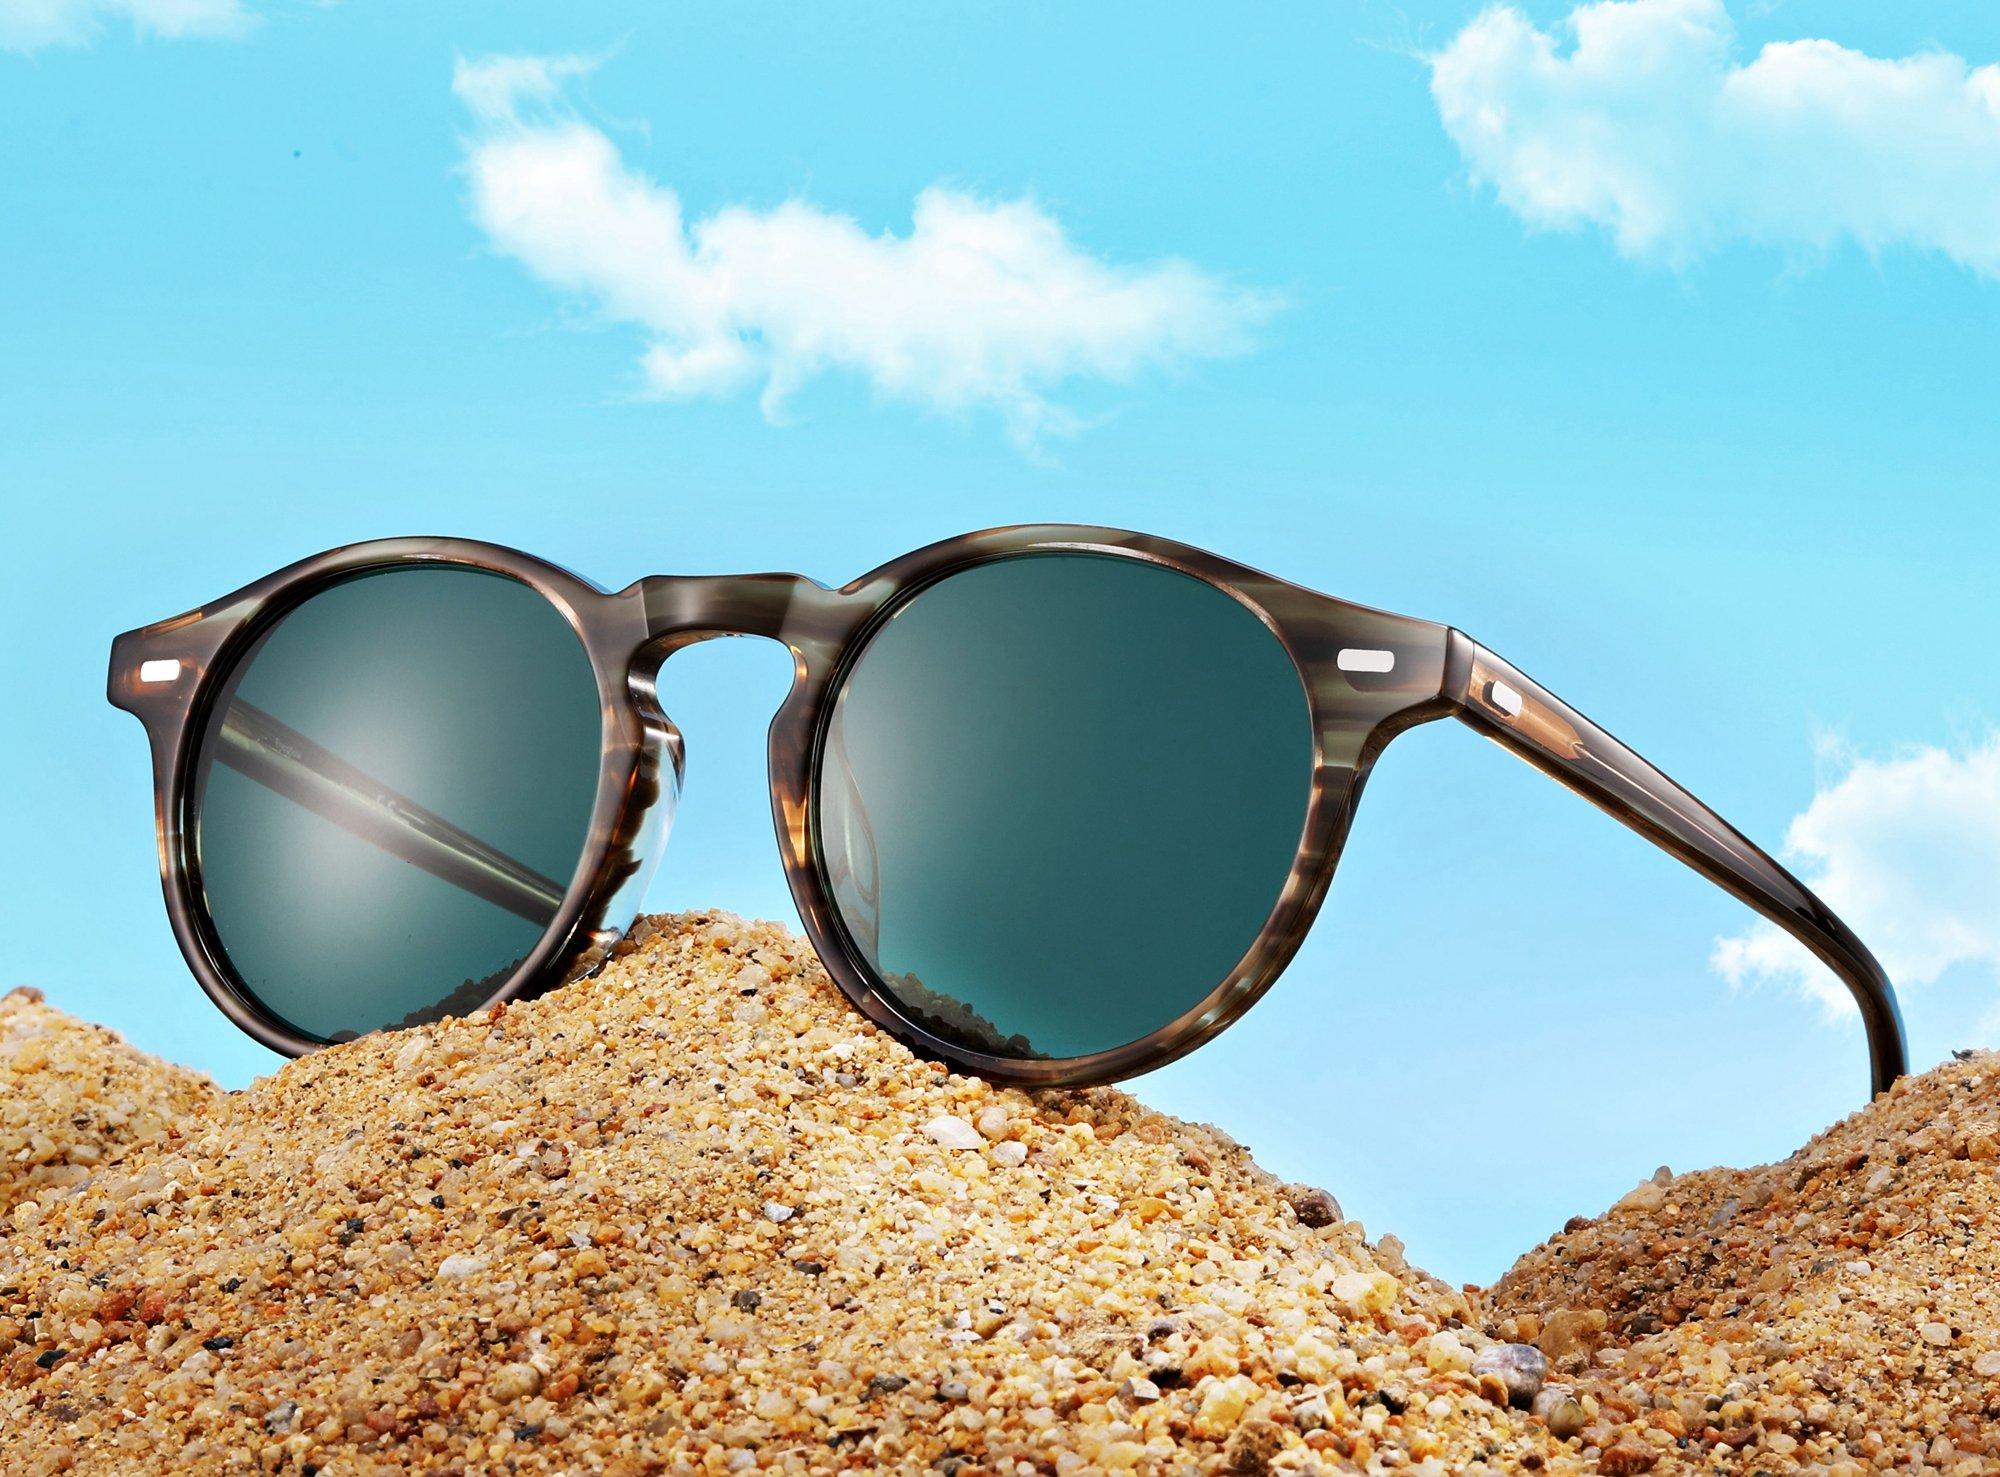 EyeGlow Vintage Round Sunglasses Women Sunglasses Men Polarized Lens 5187 Acetate material (Blonde vs green polarized lens, As pictures) by EyeGlow (Image #7)